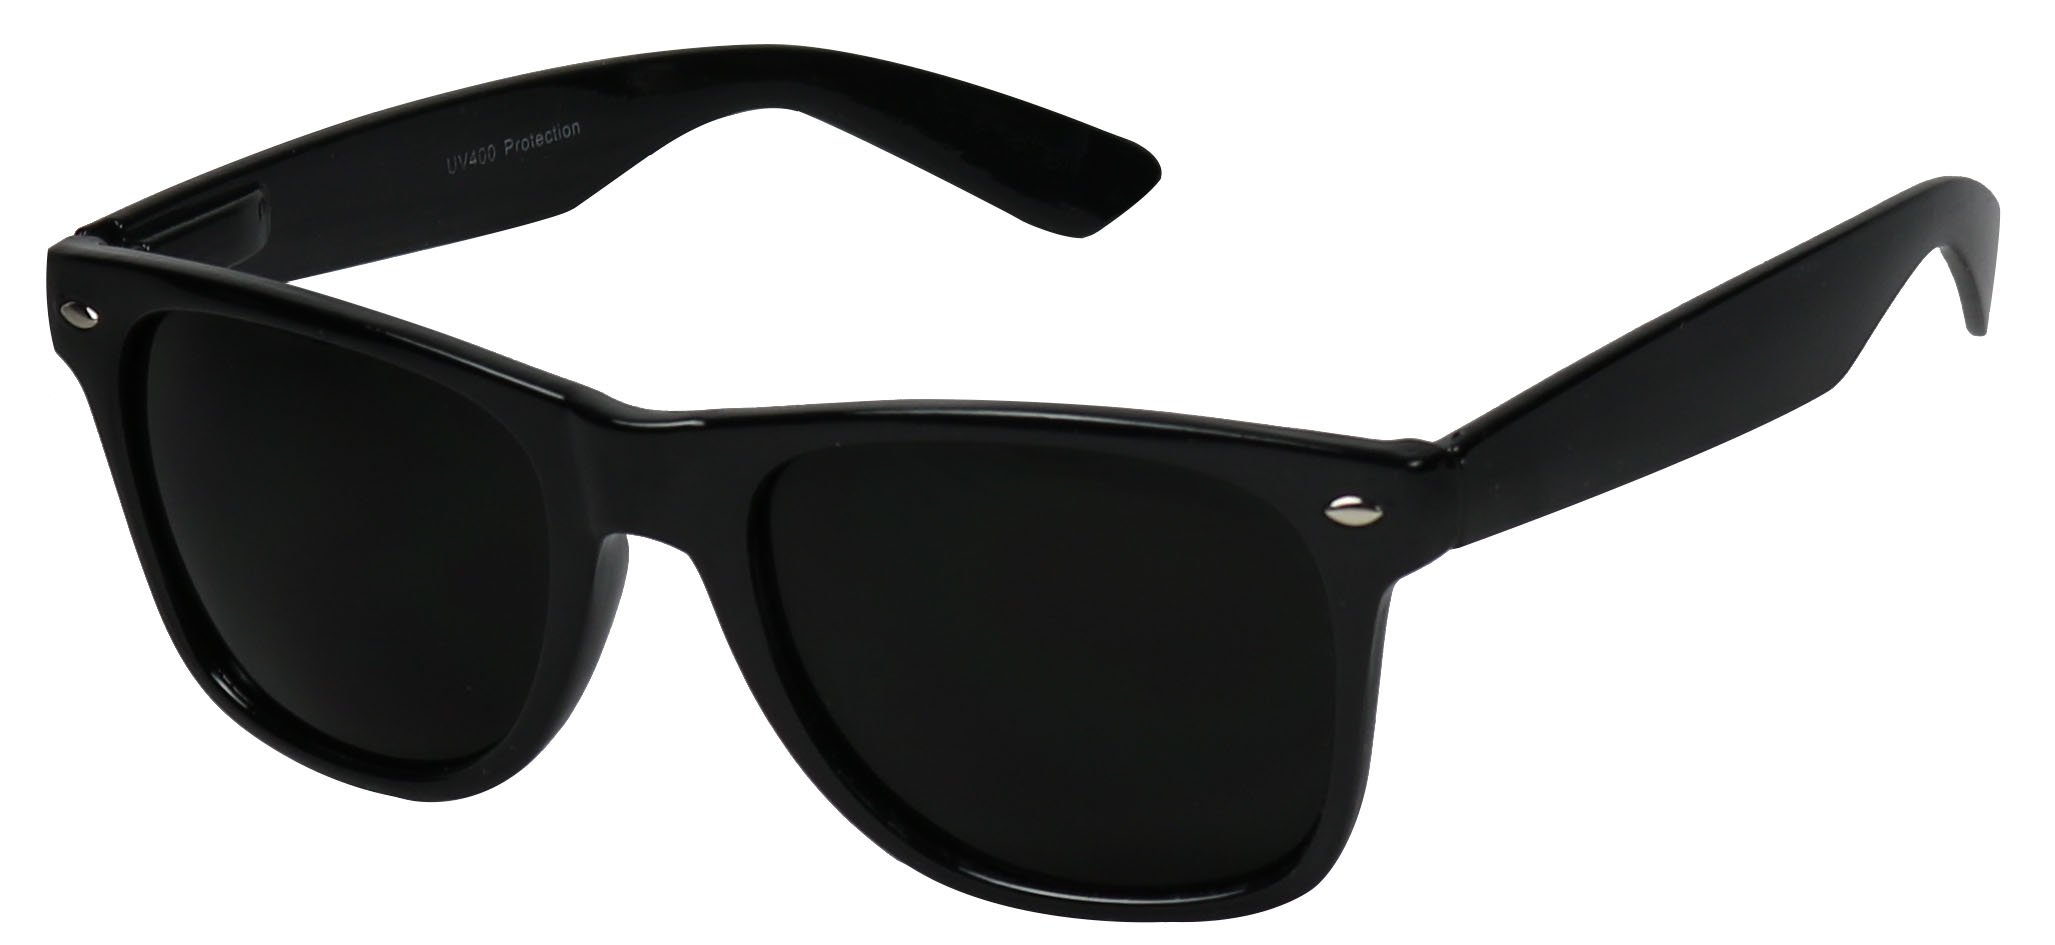 Basik Eyewear - Super Extremely Dark Black Retro Wayfarer 80's Sunglasses 1 or 2 Pairs (Glossy 2 Pack Deal, Dark Black)